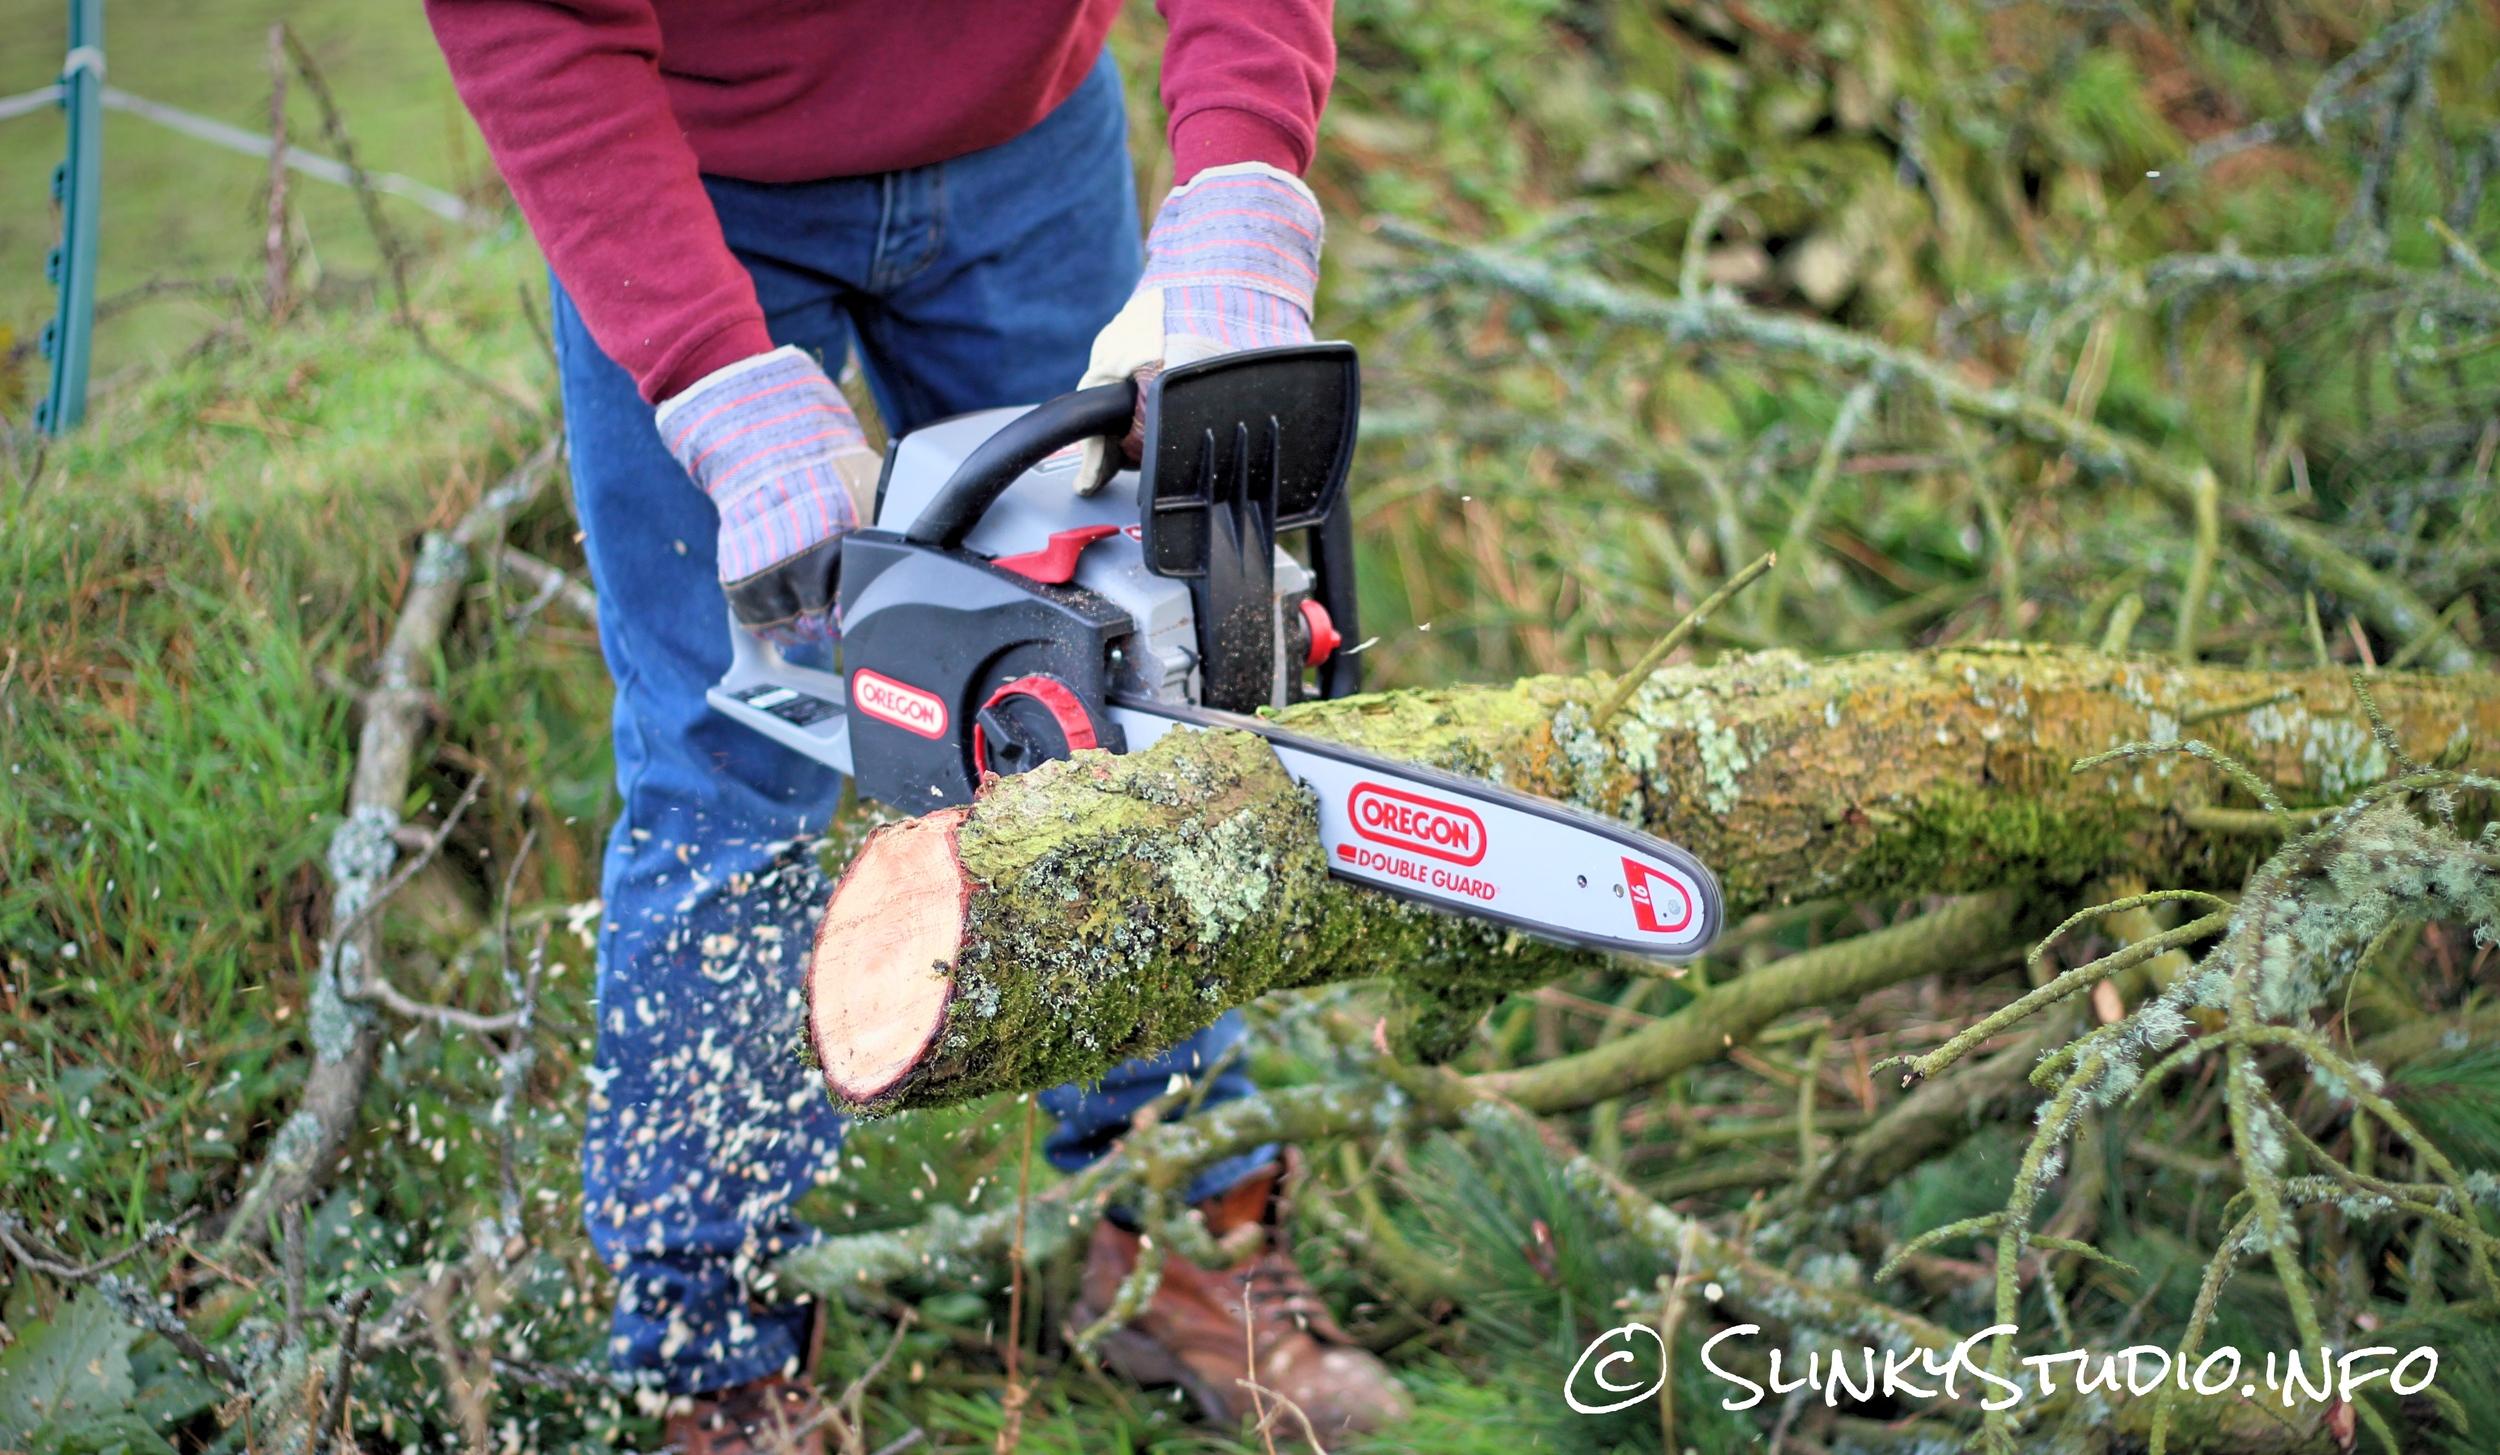 Oregon CS300 PowerNow Cordless Chainsaw Cutting Tight Grain Tree.jpg